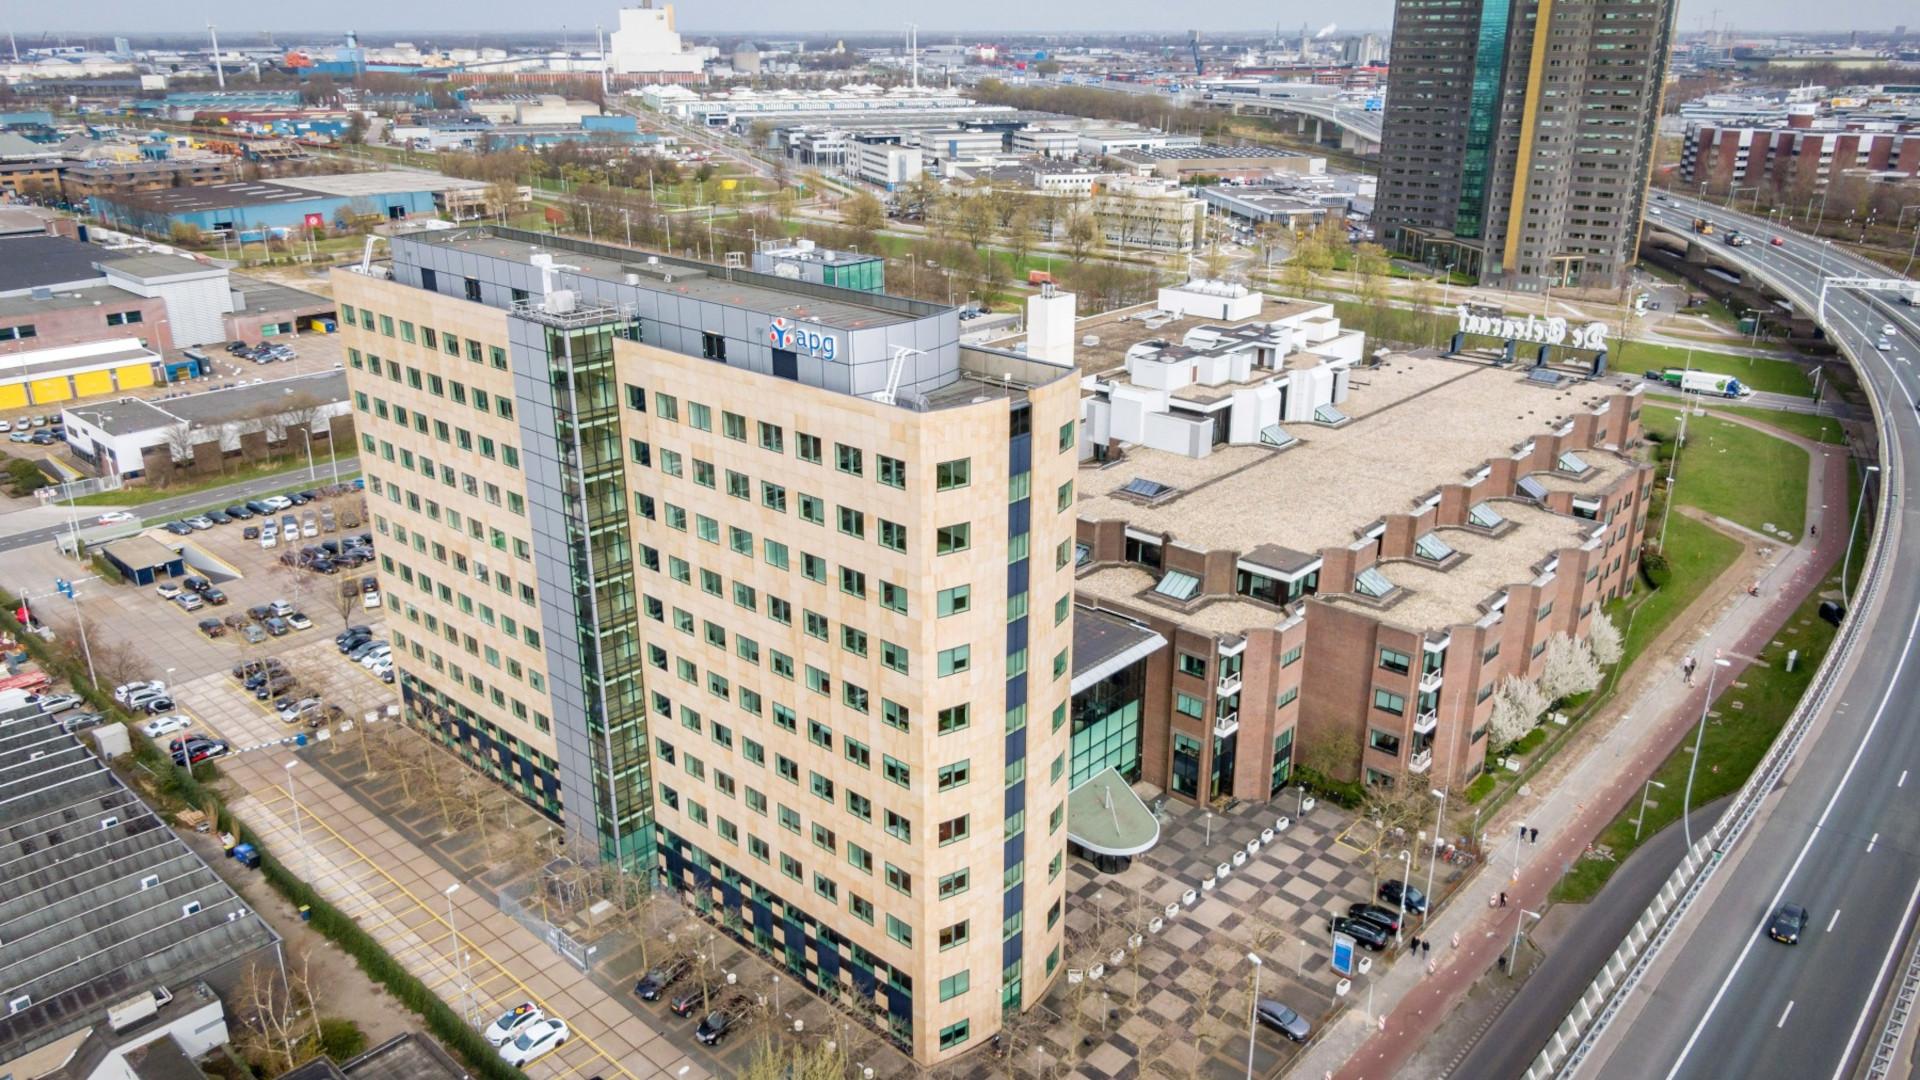 Basisweg Telegraaf gebouw Amsterdam laserscanning.jpg